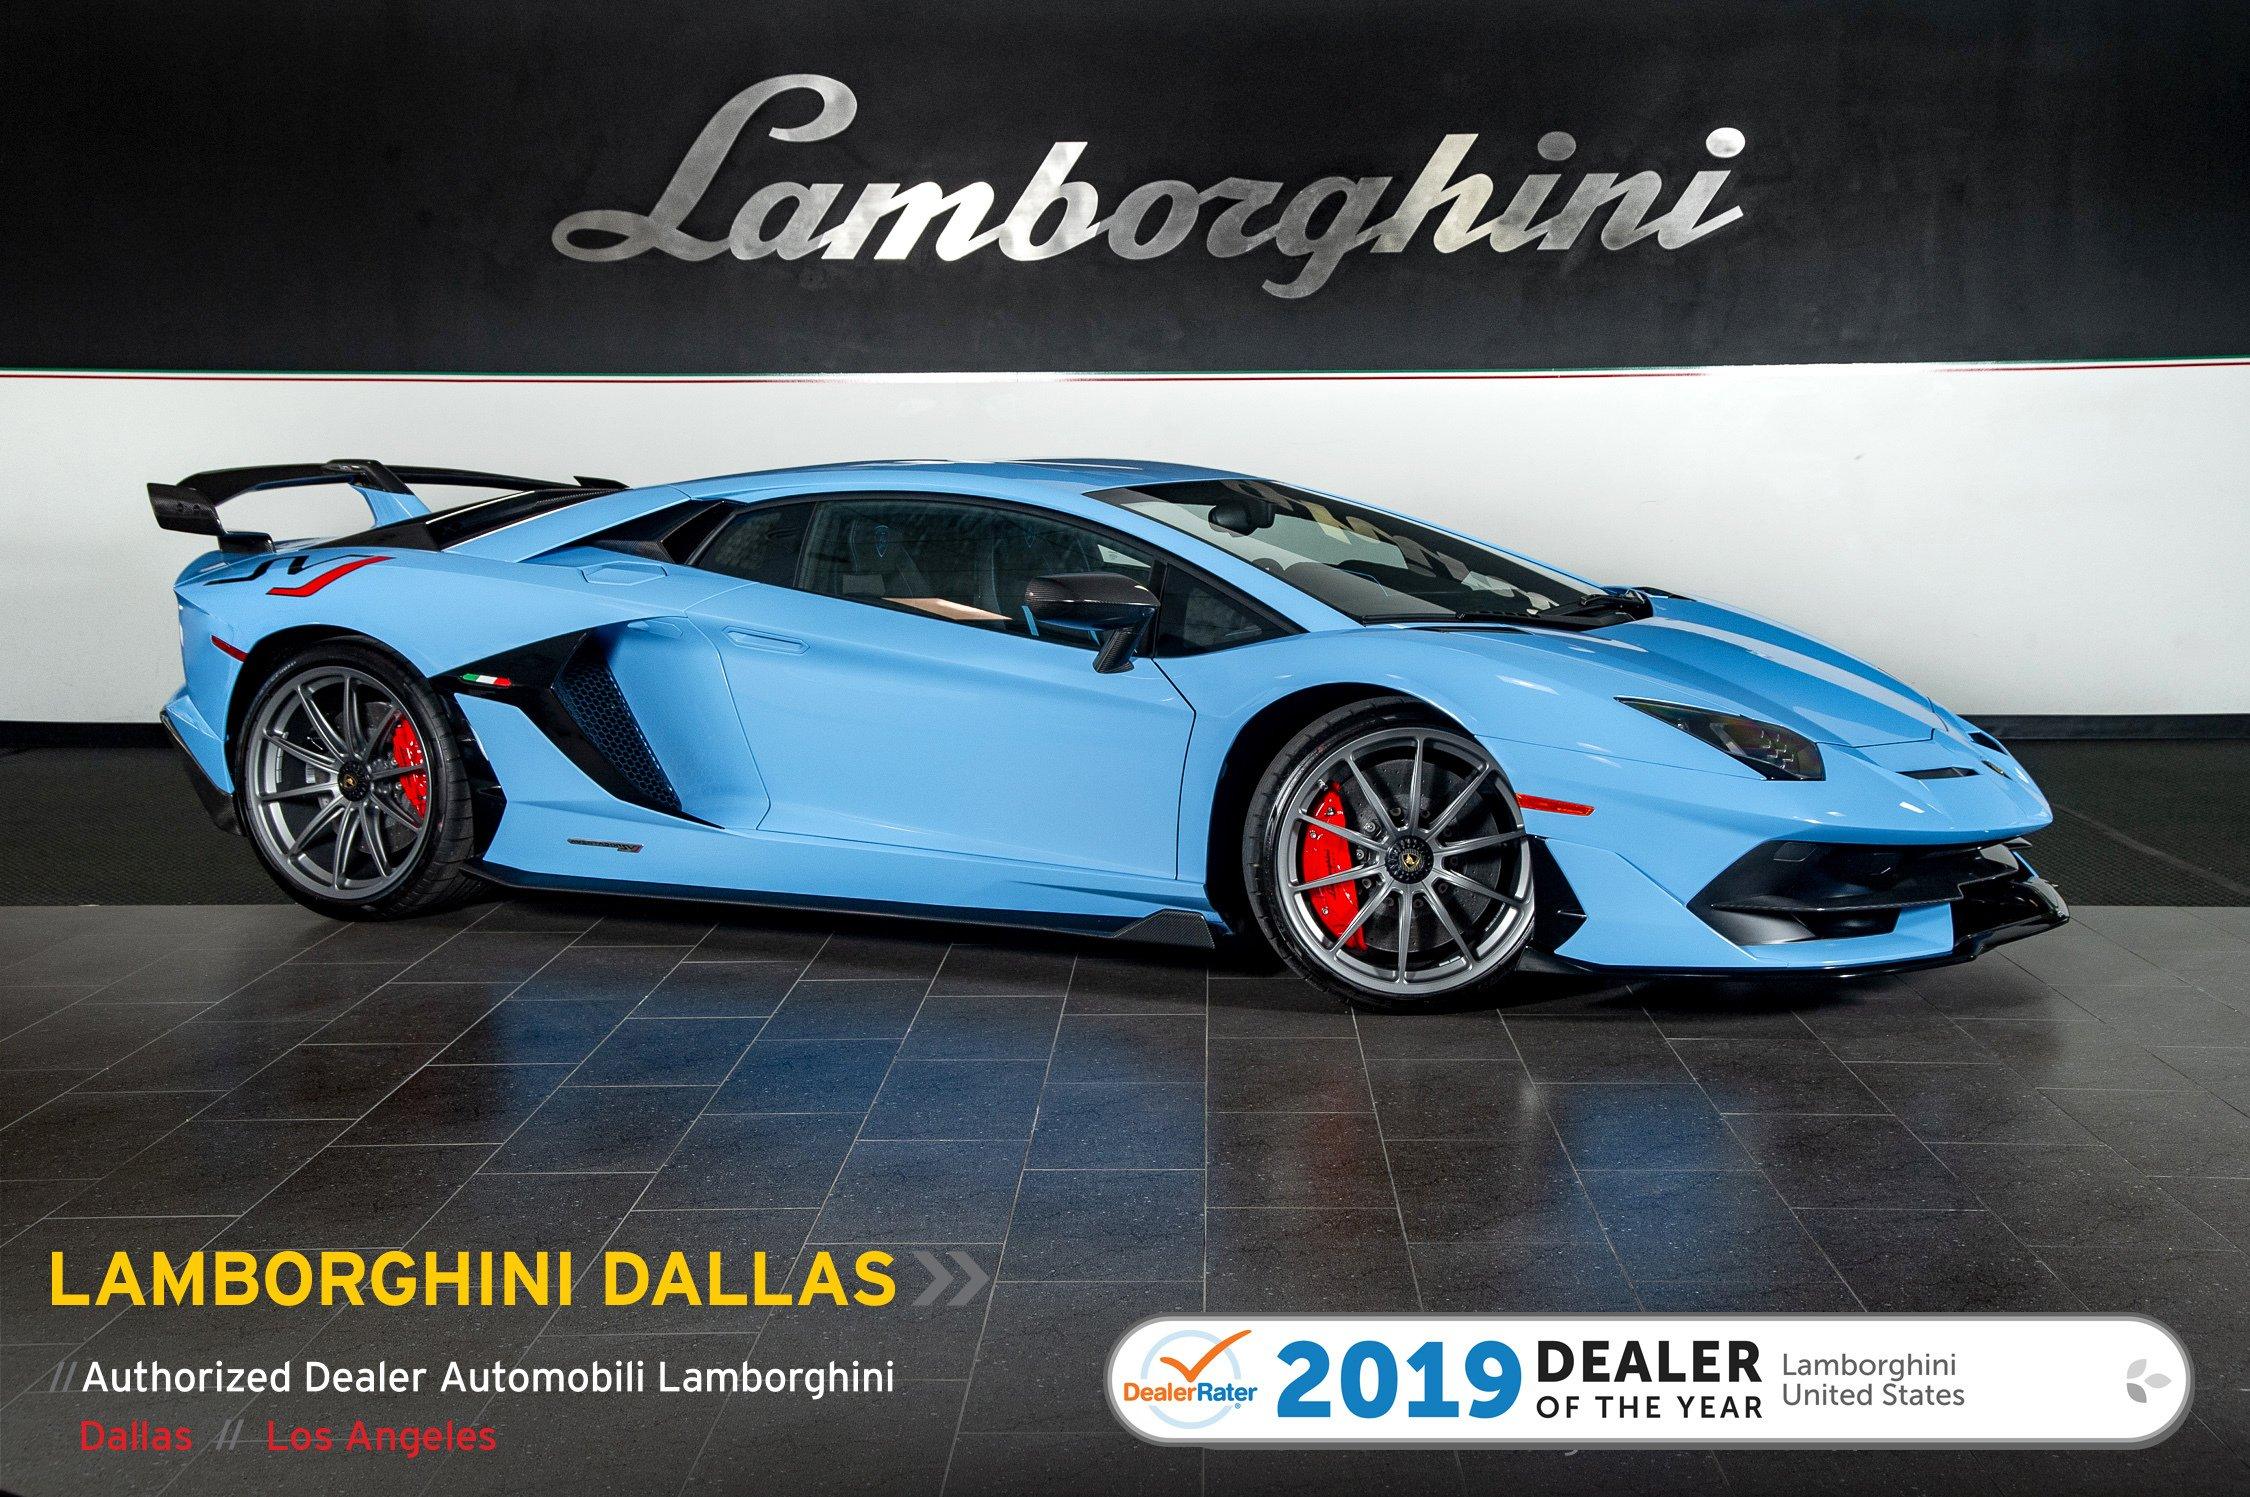 New 2019 Lamborghini Aventador Svj For Sale Richardson Tx Lamborghini Dallas Stock 19l0195 Vin Zhwum6zd8kla08700